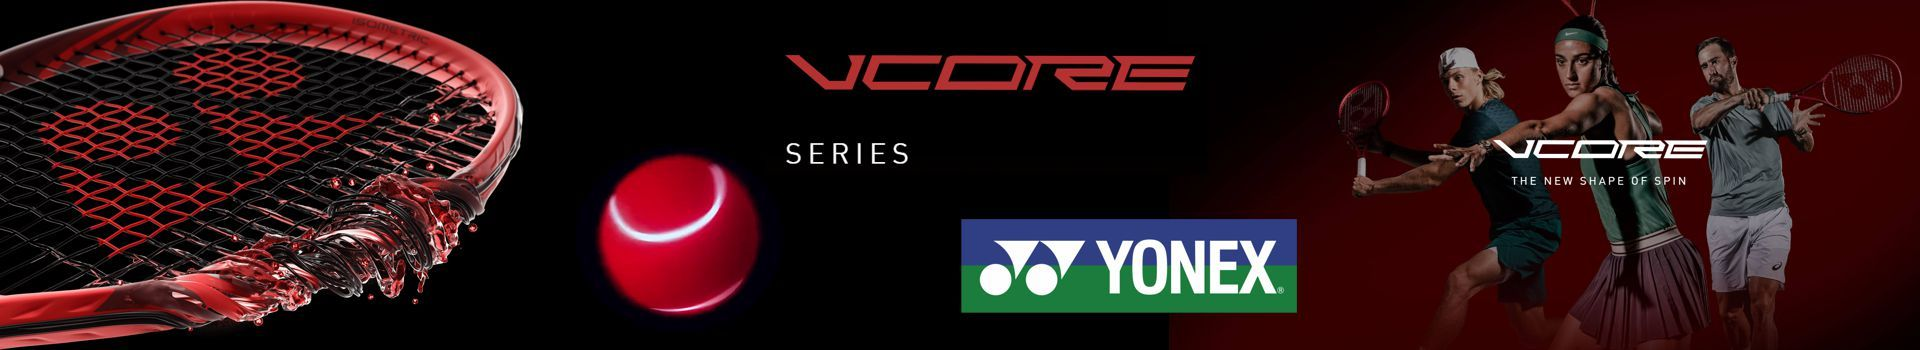 slider_1_yonex_vcore_series